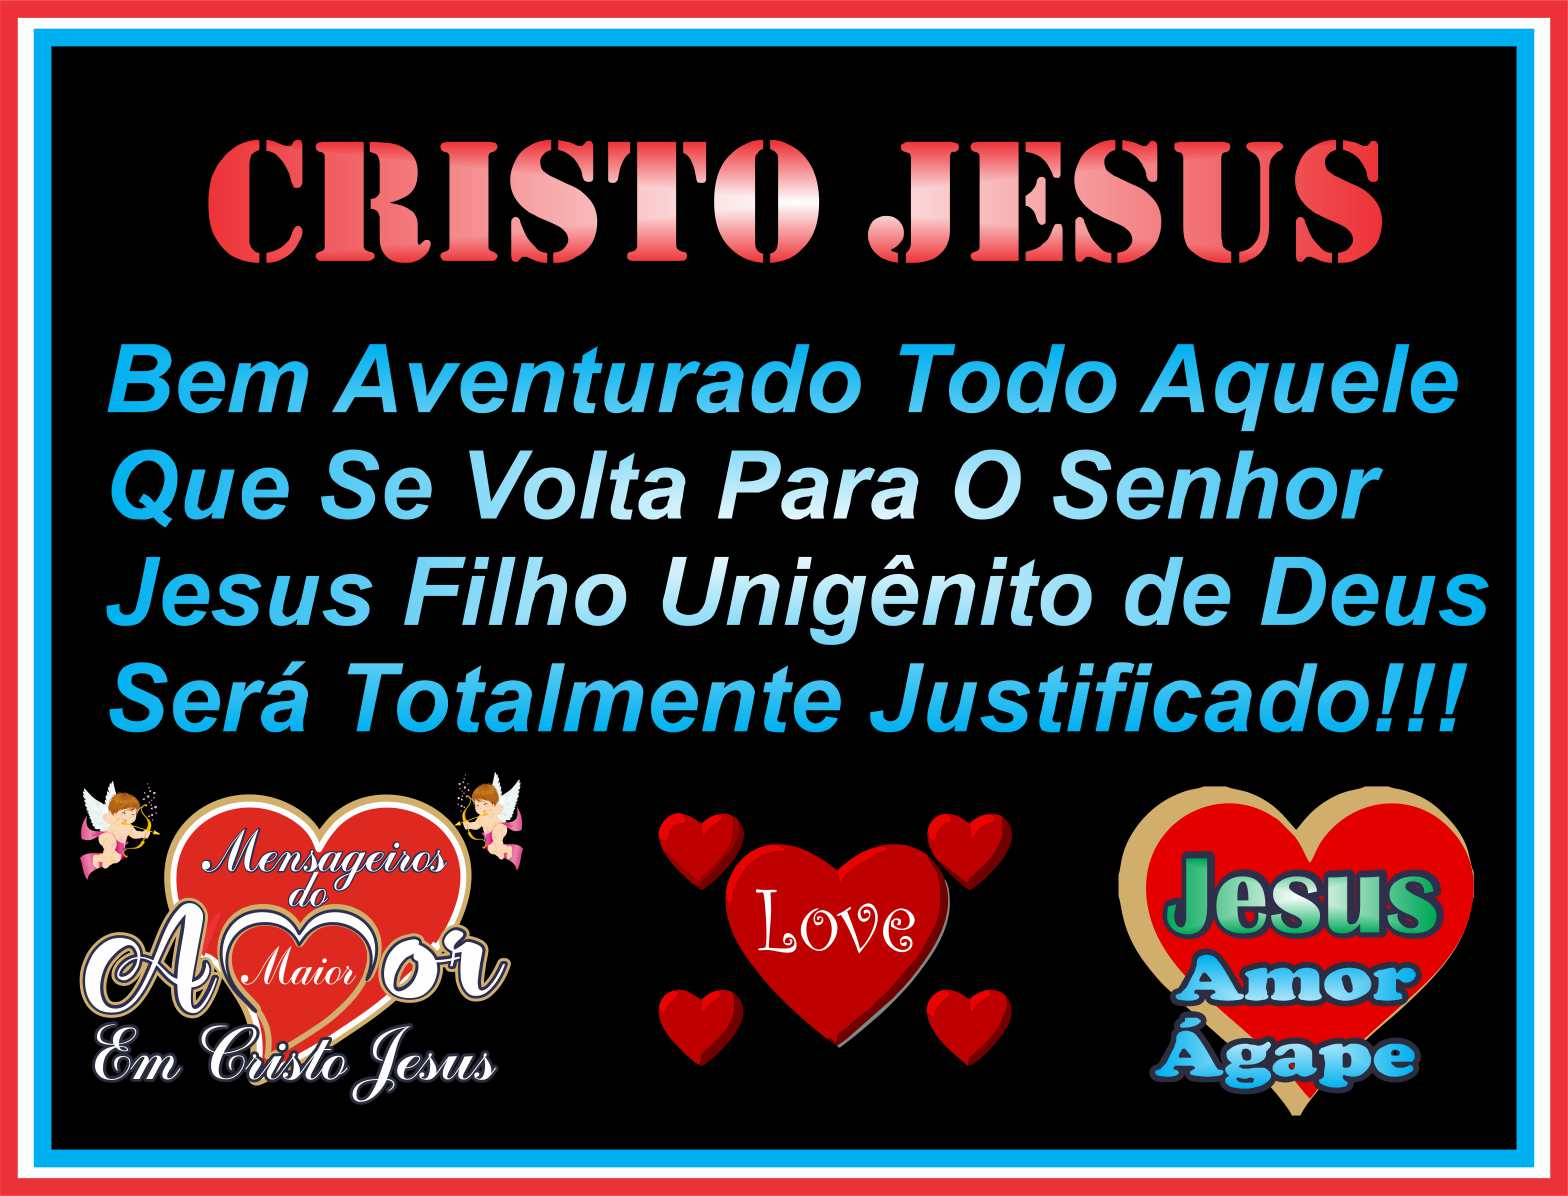 Todo Aquele Que Se Volta Para O Senhor Jesus Cristo Será Totalmente Justificado